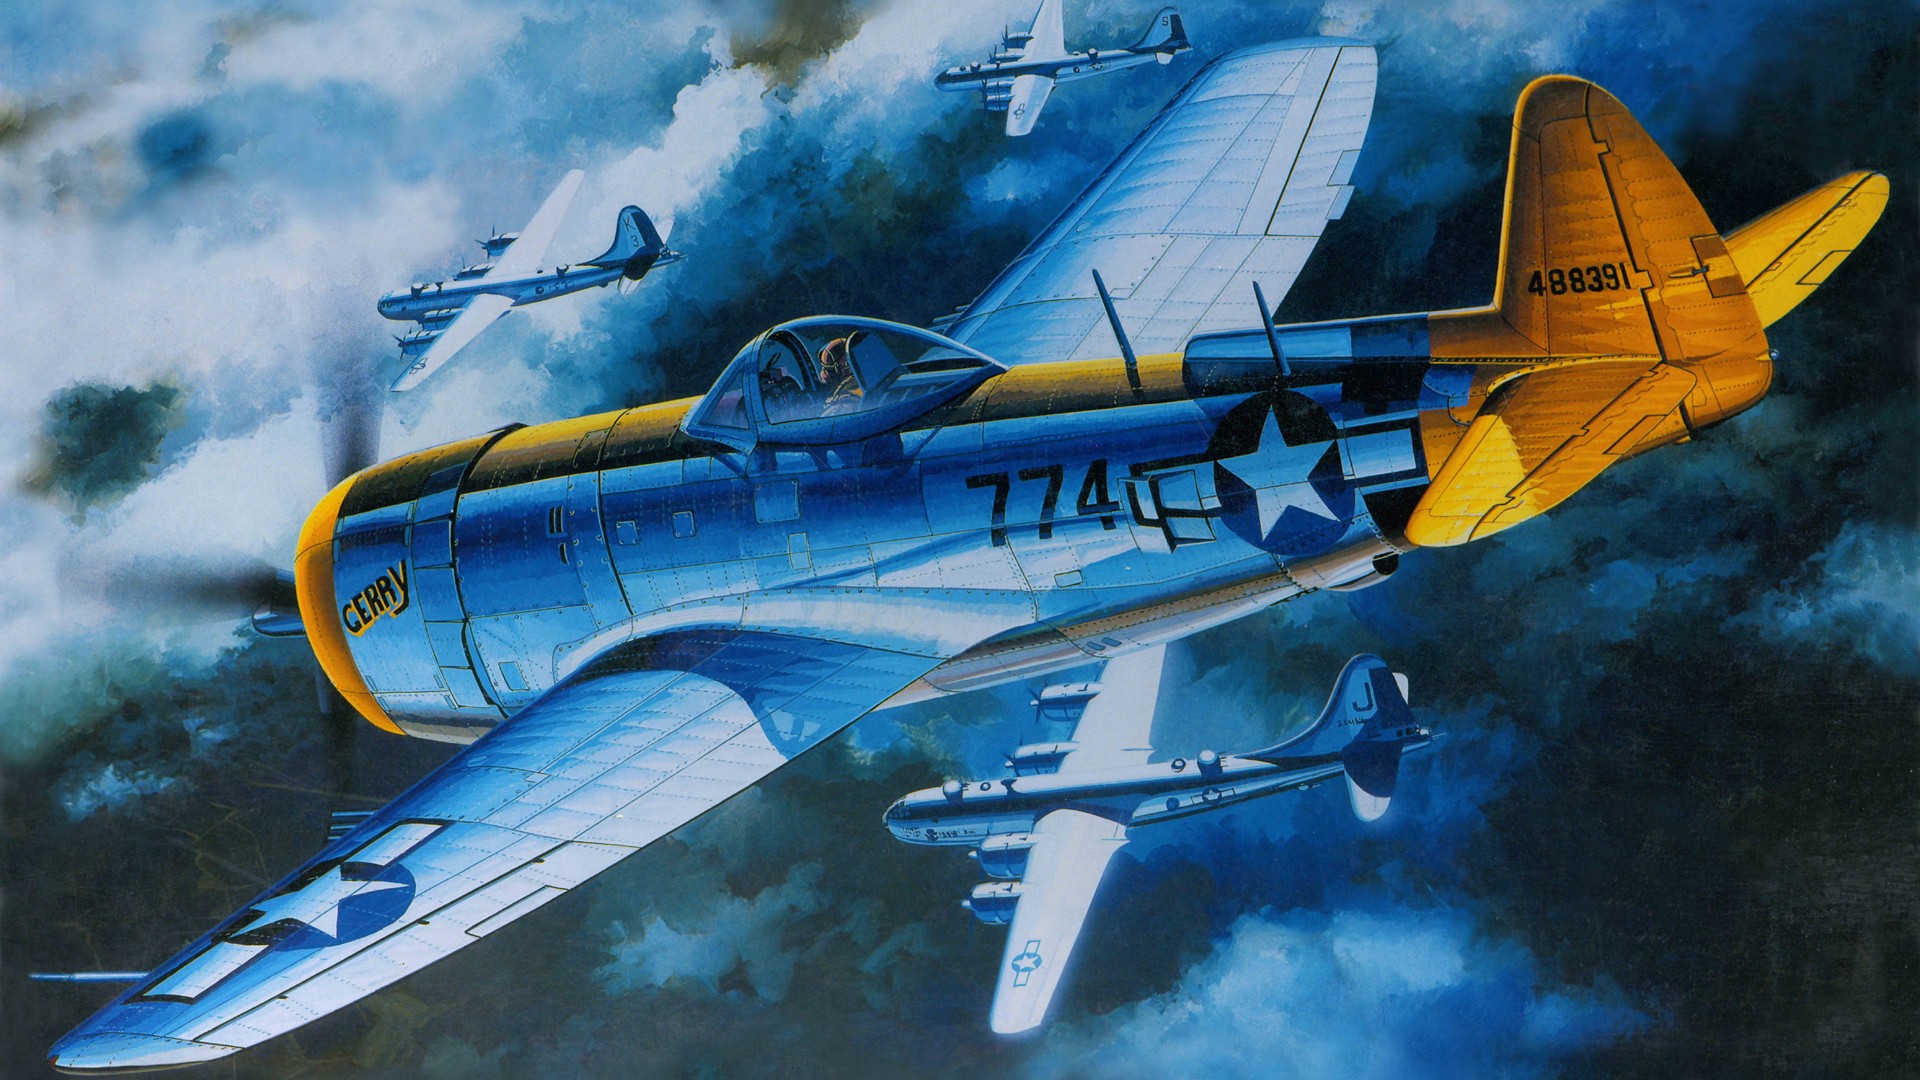 Wallpaper republic p 47 thunderbolt fighter bomber the us air 1680x1050